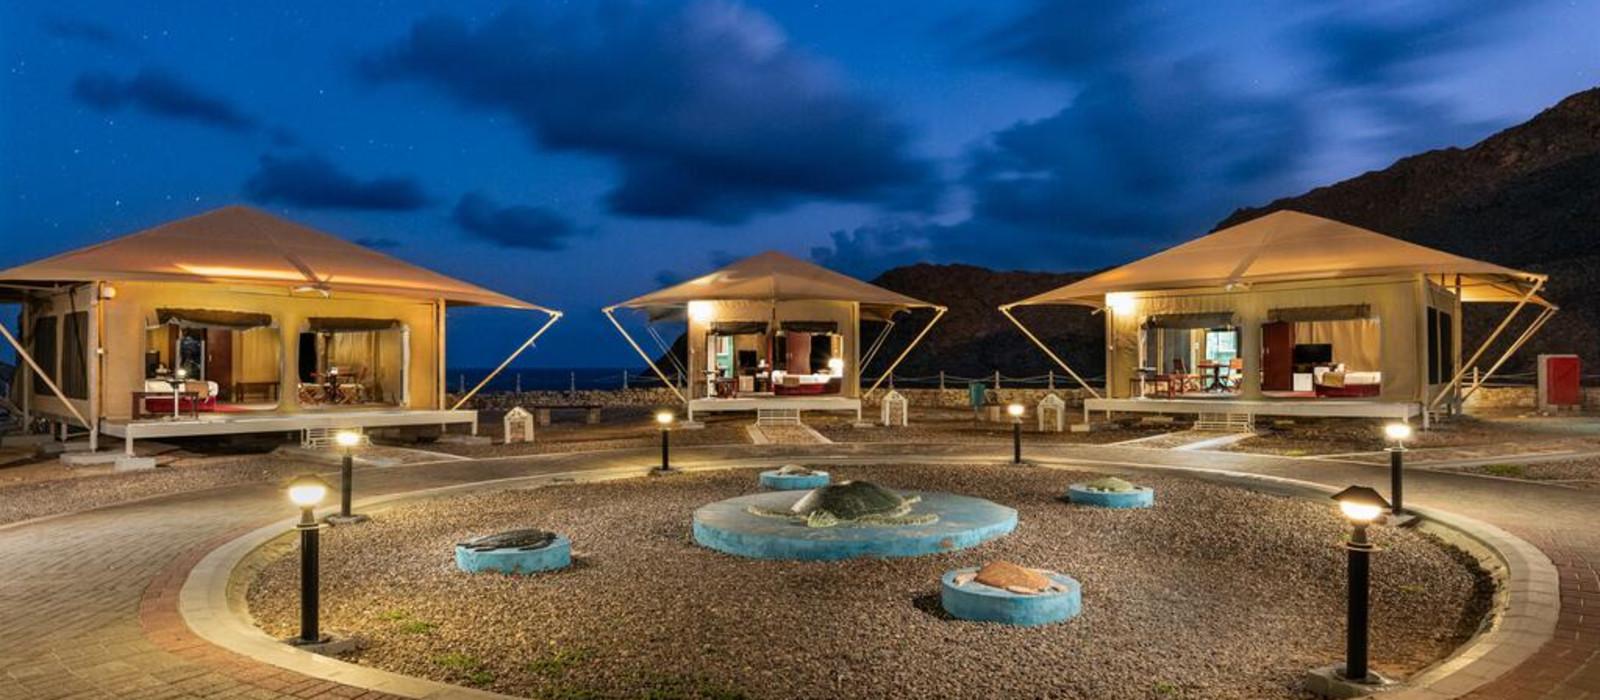 Hotel Ras Al Jinz Turtle Reserve Oman